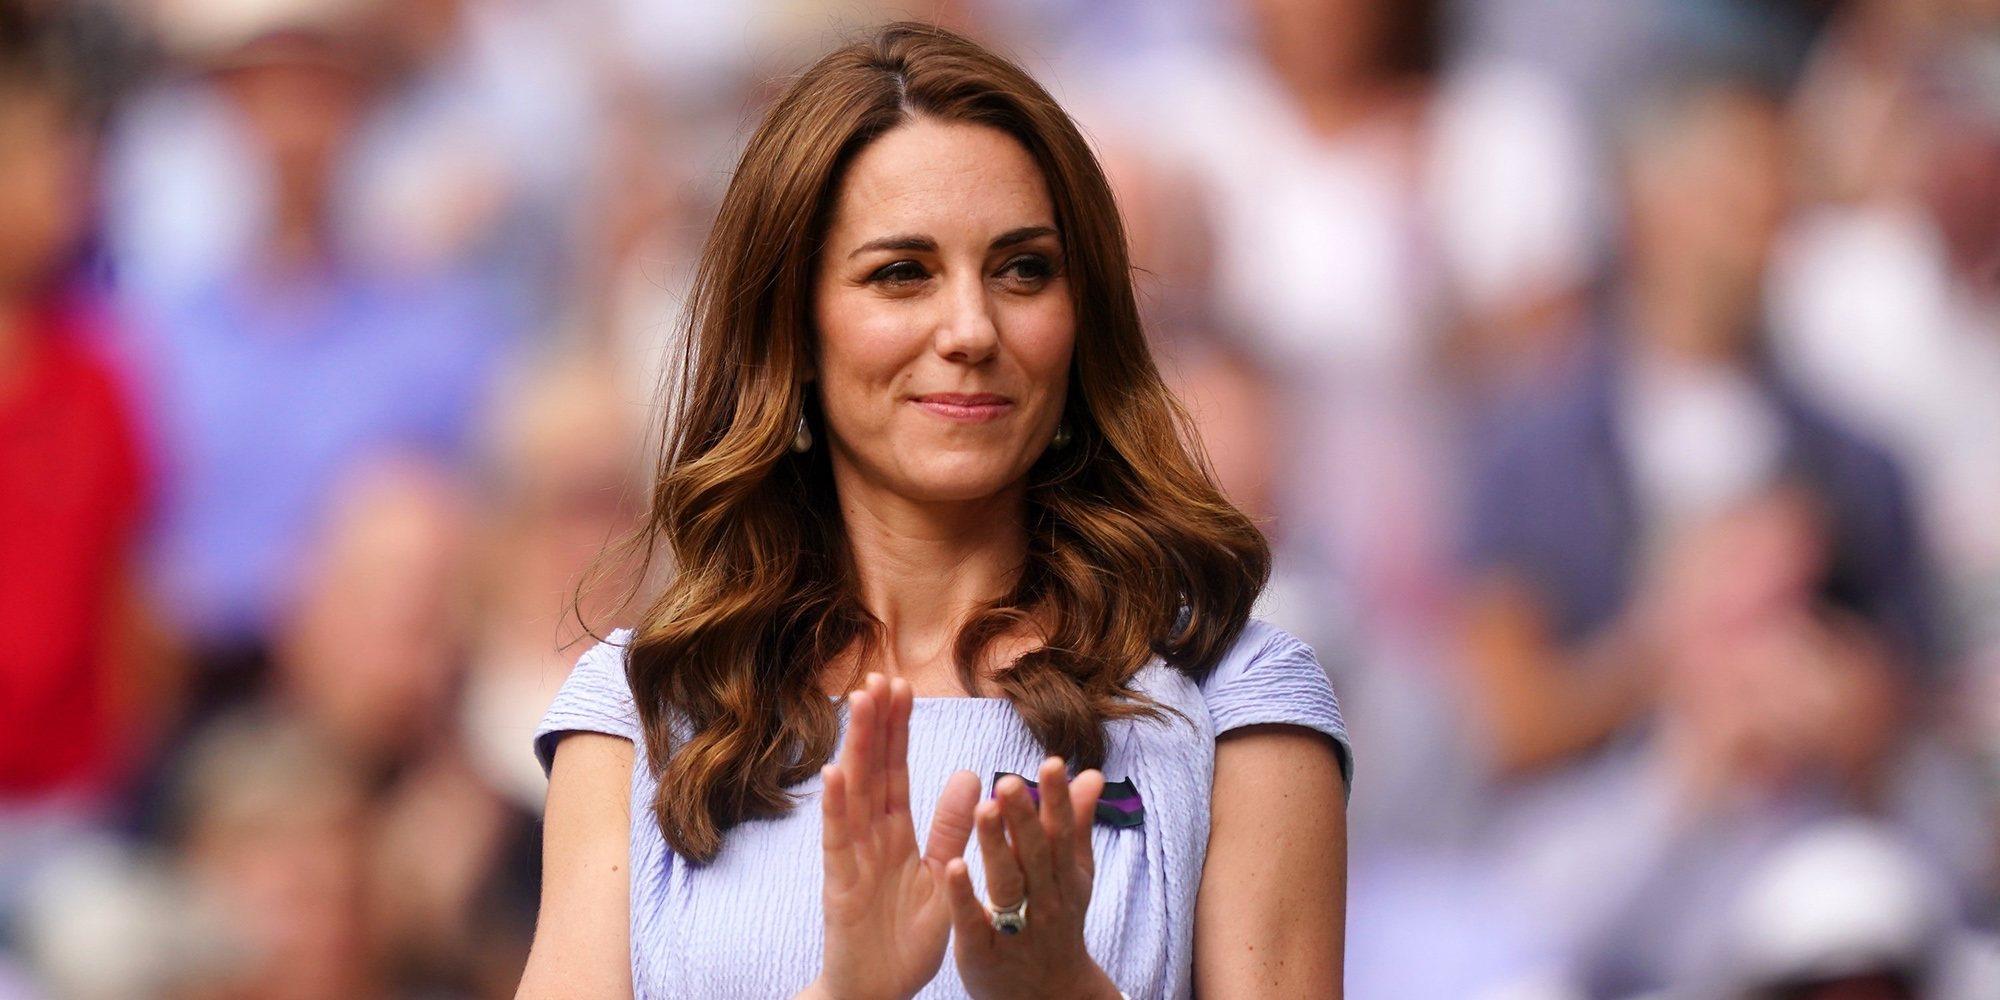 Kate Middleton apoyó a su hermano James Middleton en su lucha contra la depresión yendo a terapia con él